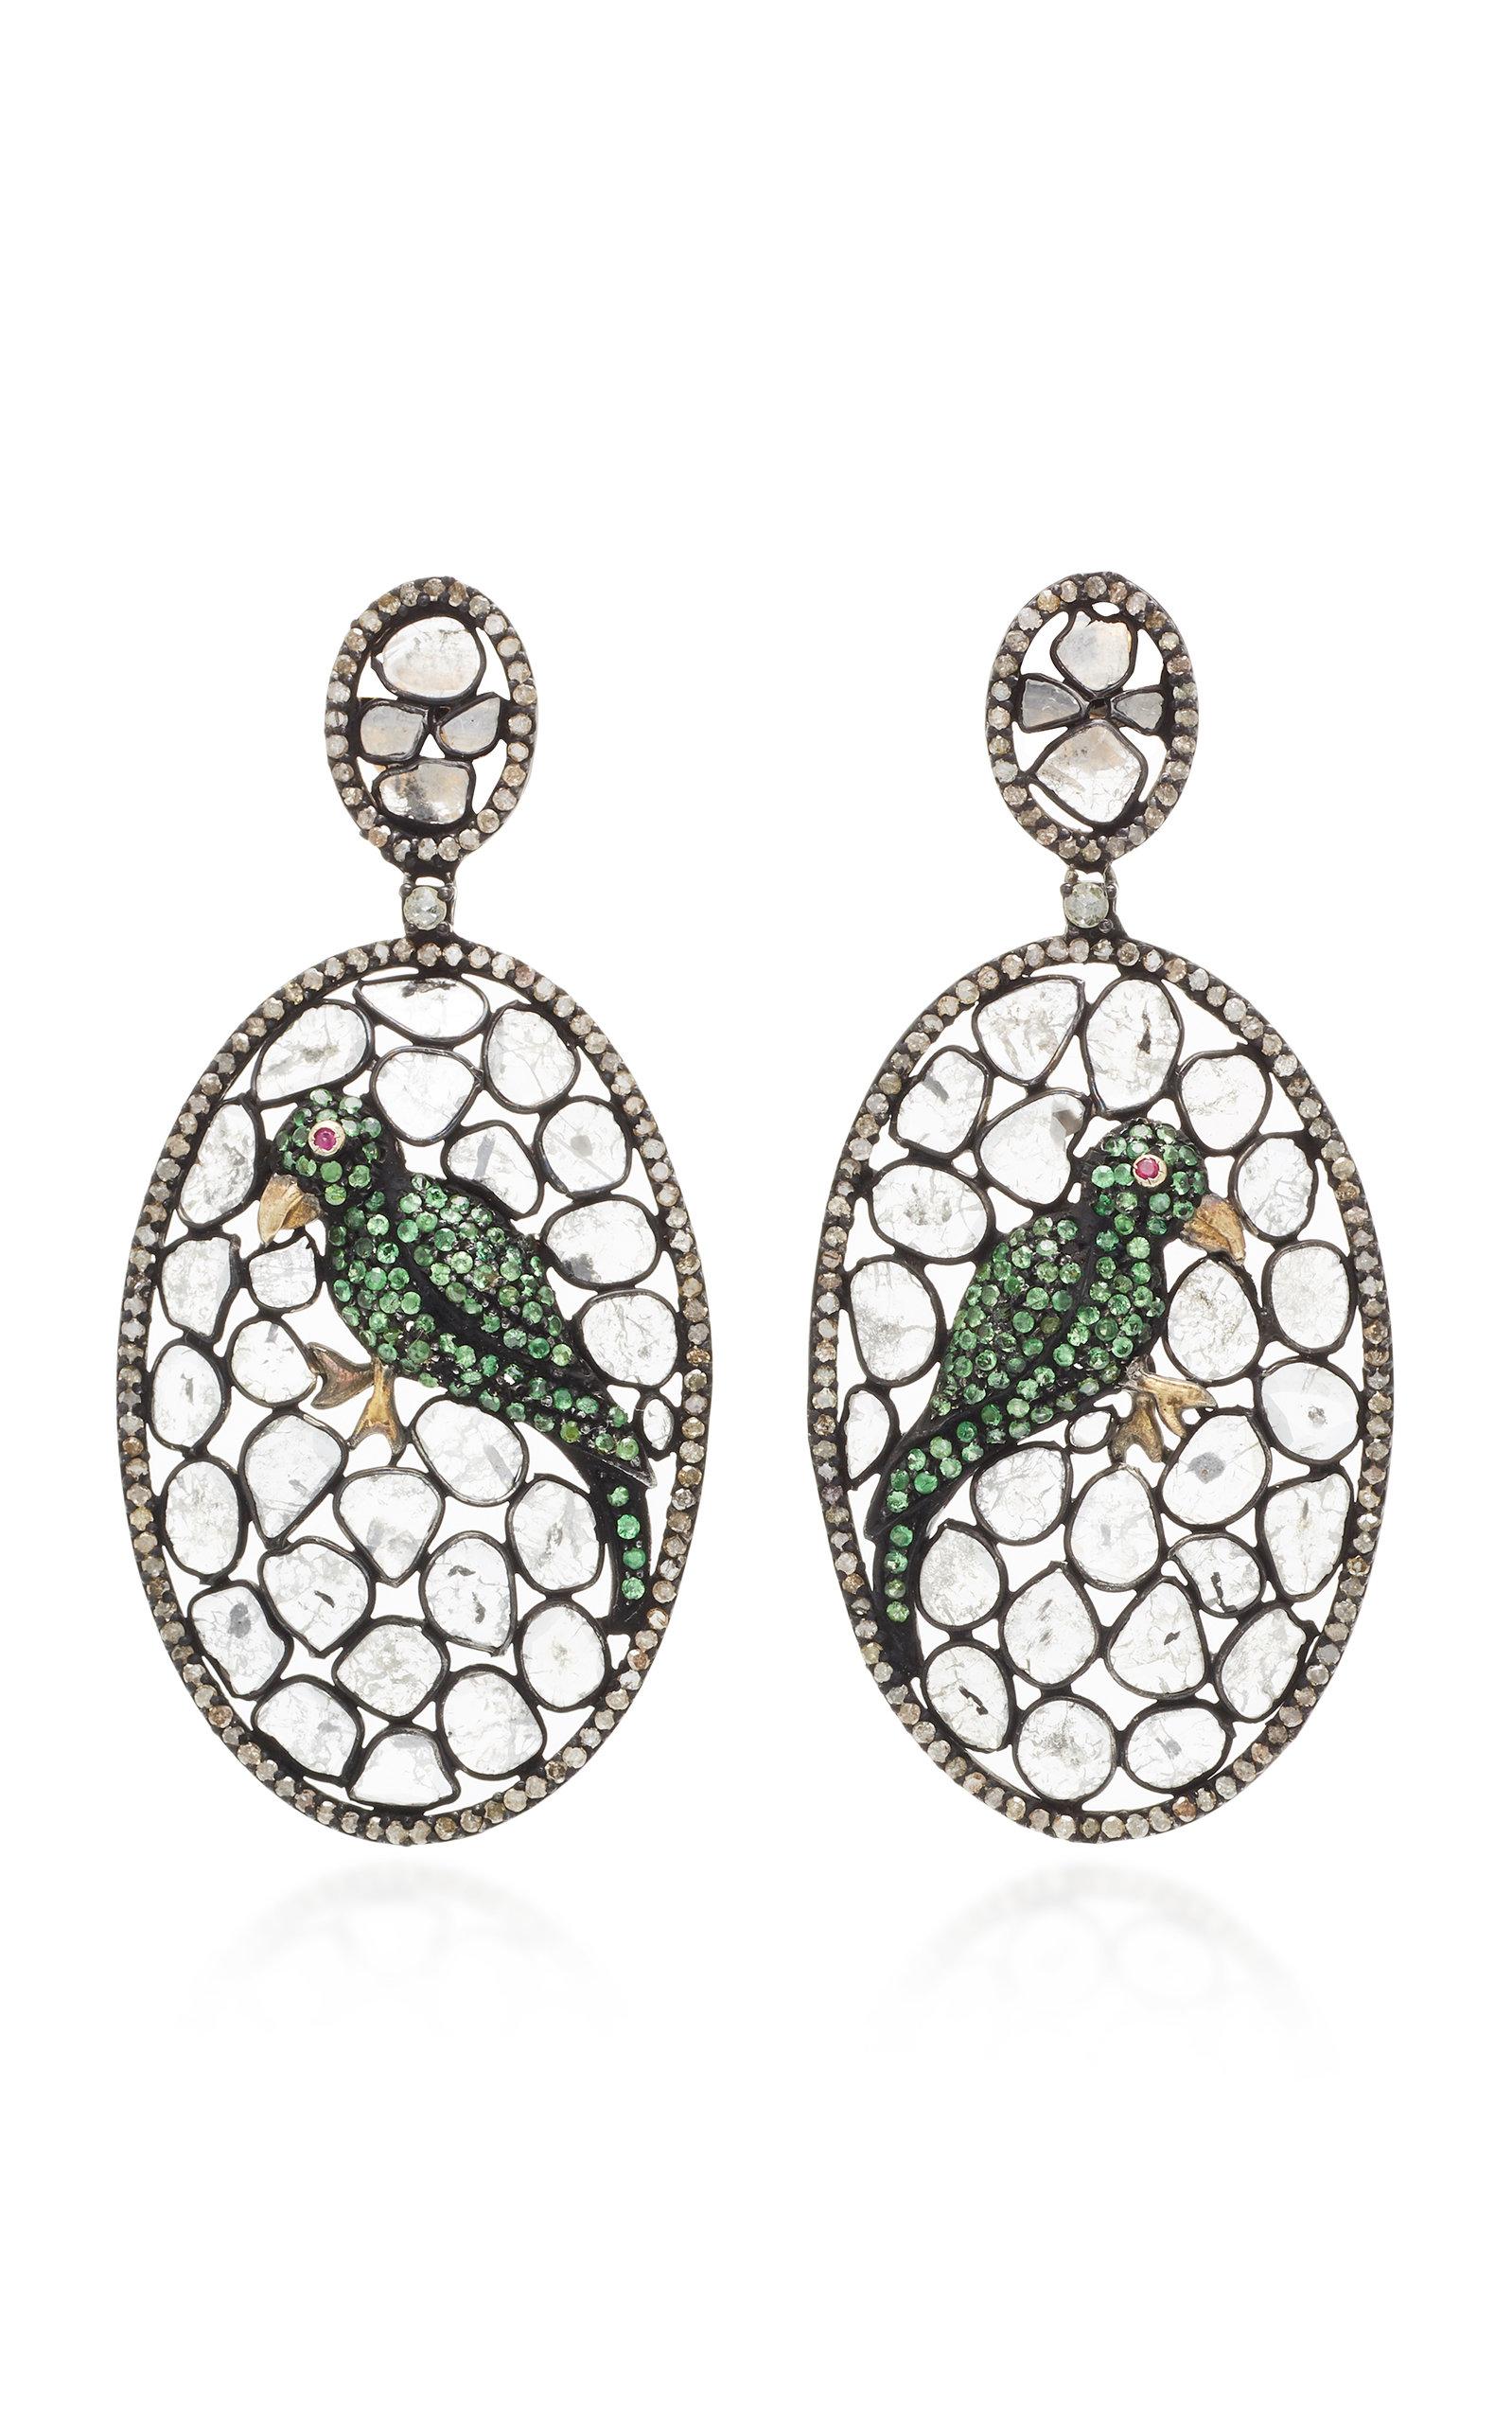 14K Gold Multi-Stone Earrings Amrapali q6IwyQix7